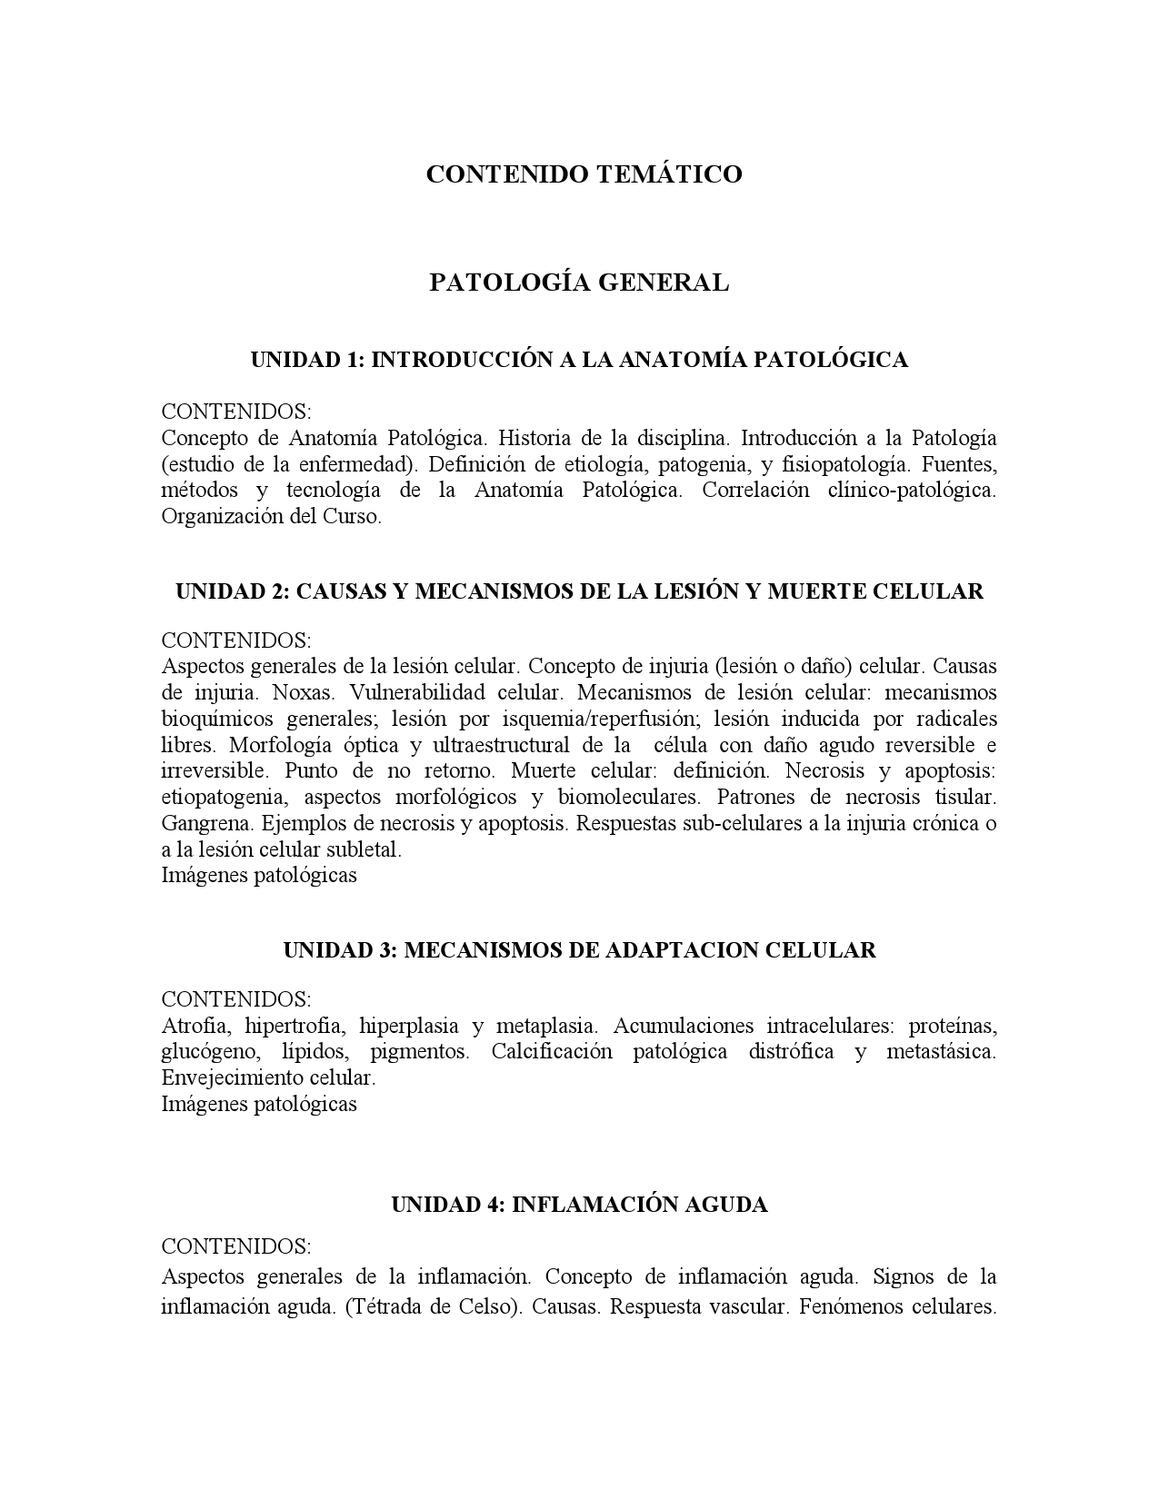 patologia general by daniela gutierrez - issuu